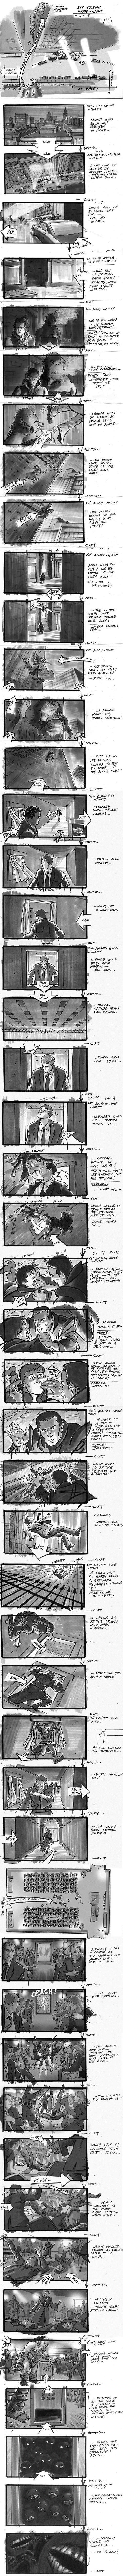 Movie Storyboard: 'Hellboy 2: The Golden Army' Storyboard Artist: Josh Sheppard